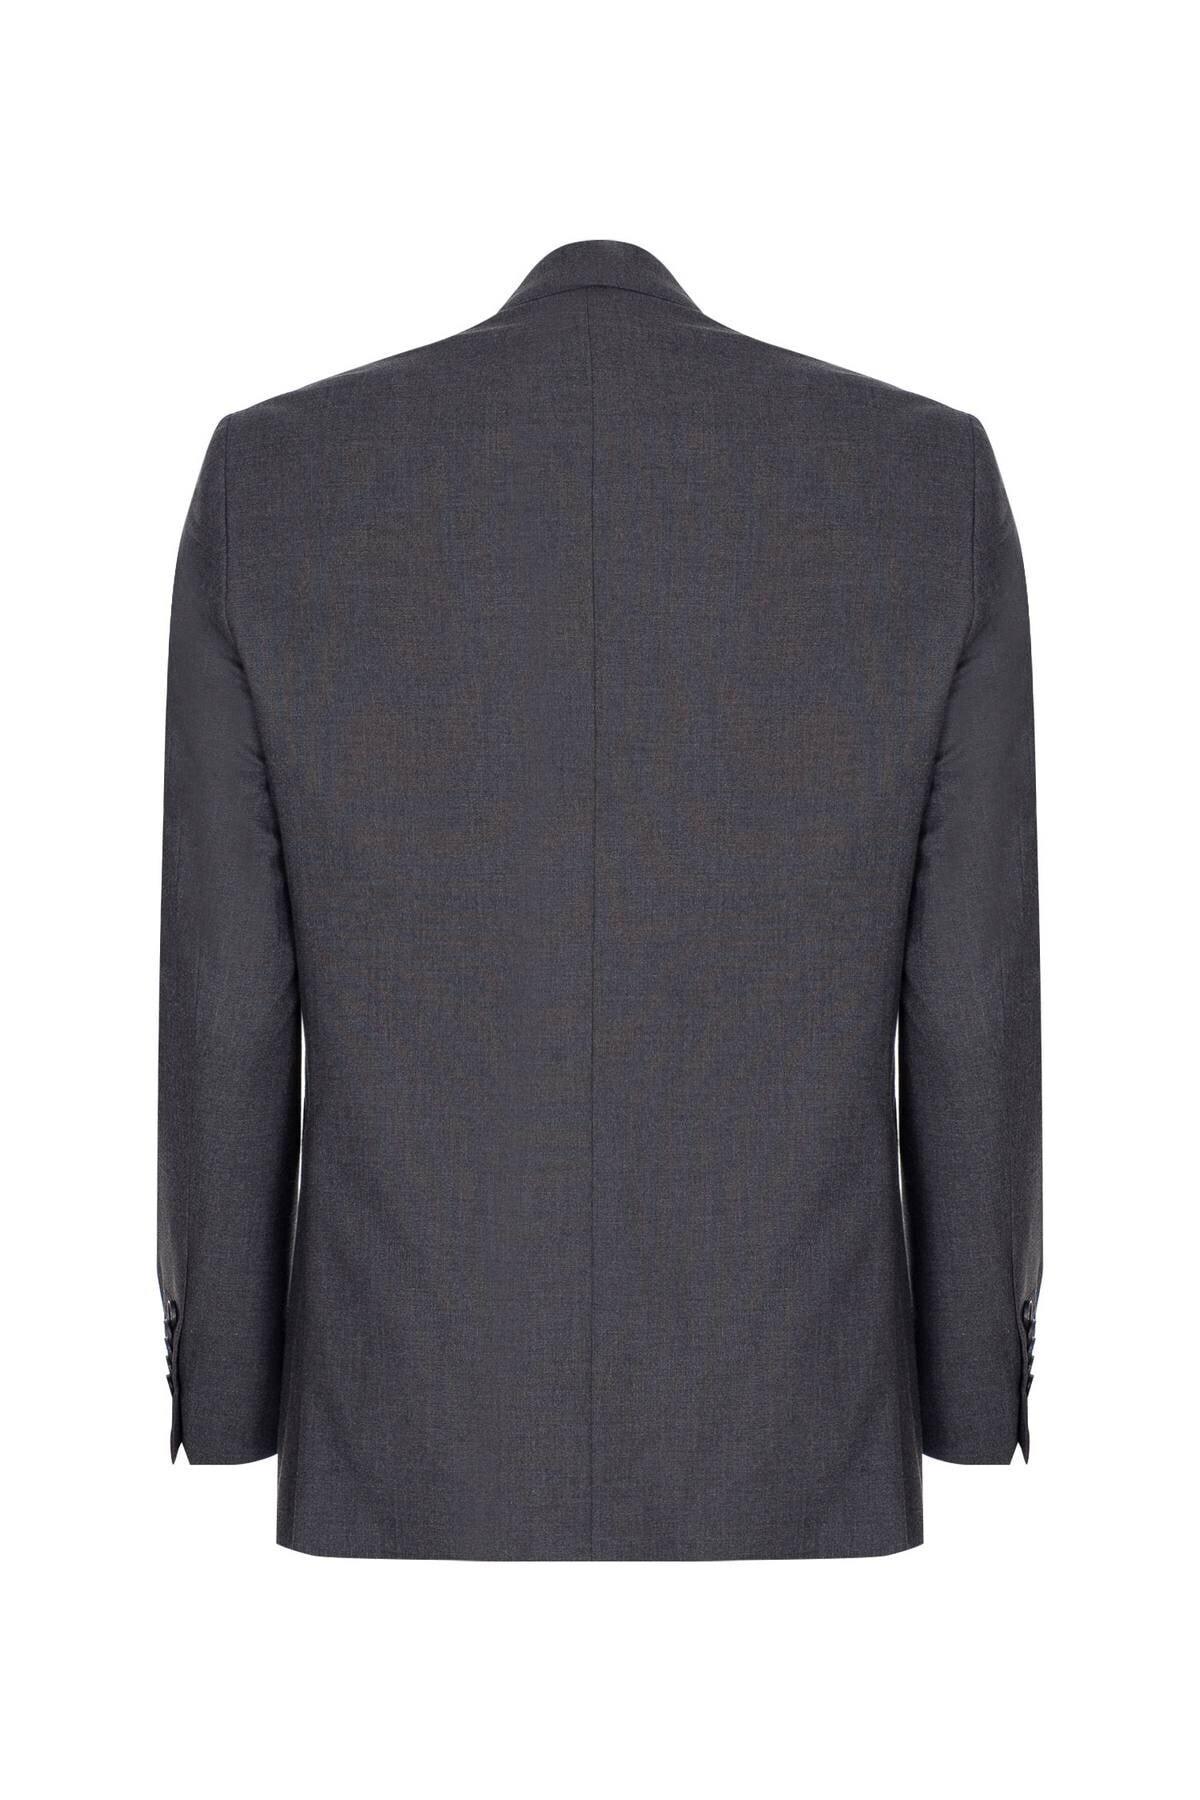 İgs Erkek Füme Regularfıt / Rahat Kalıp Std Takım Elbise 2